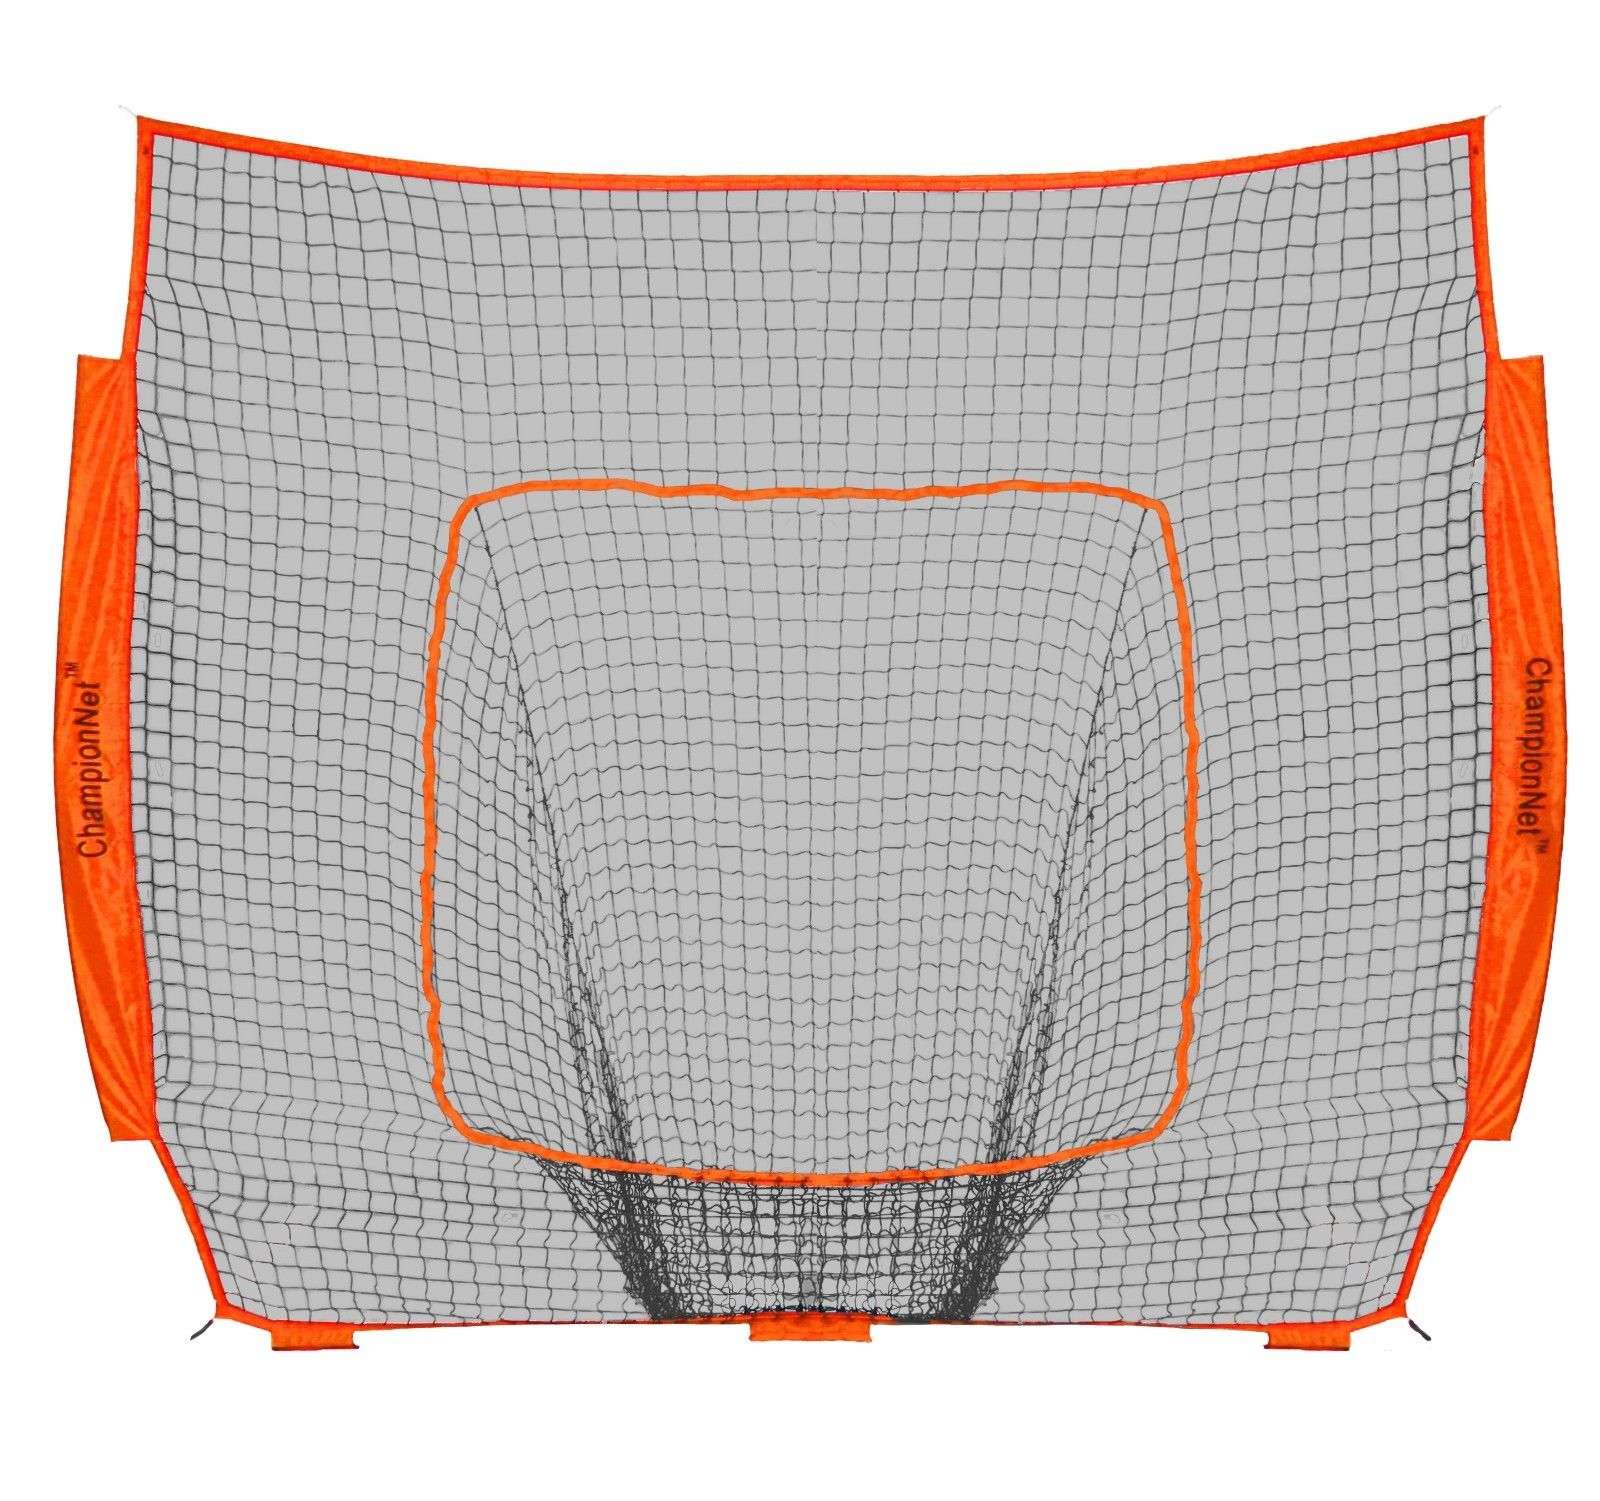 ChampionNet Baseball/Softball 7' x 7' Hitting Net Replacement NO FRAME - Orange